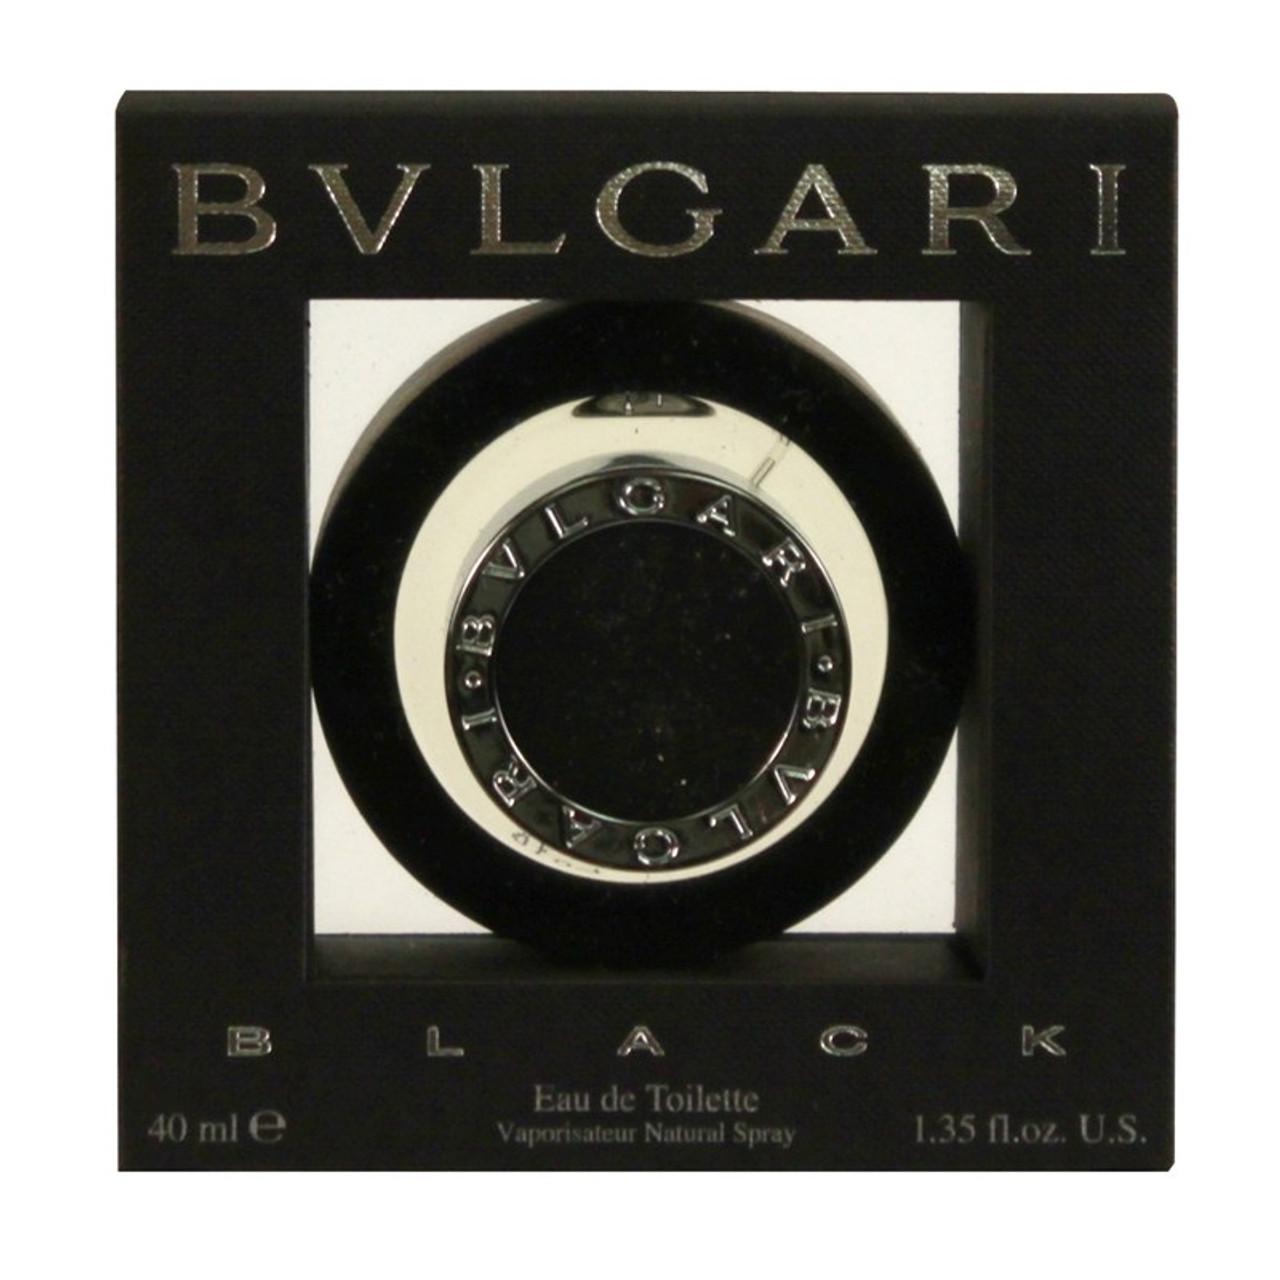 0484daa9b41 Bvlgari Black Unisex eau de toilette spray 1.3 oz - Perfume Depot